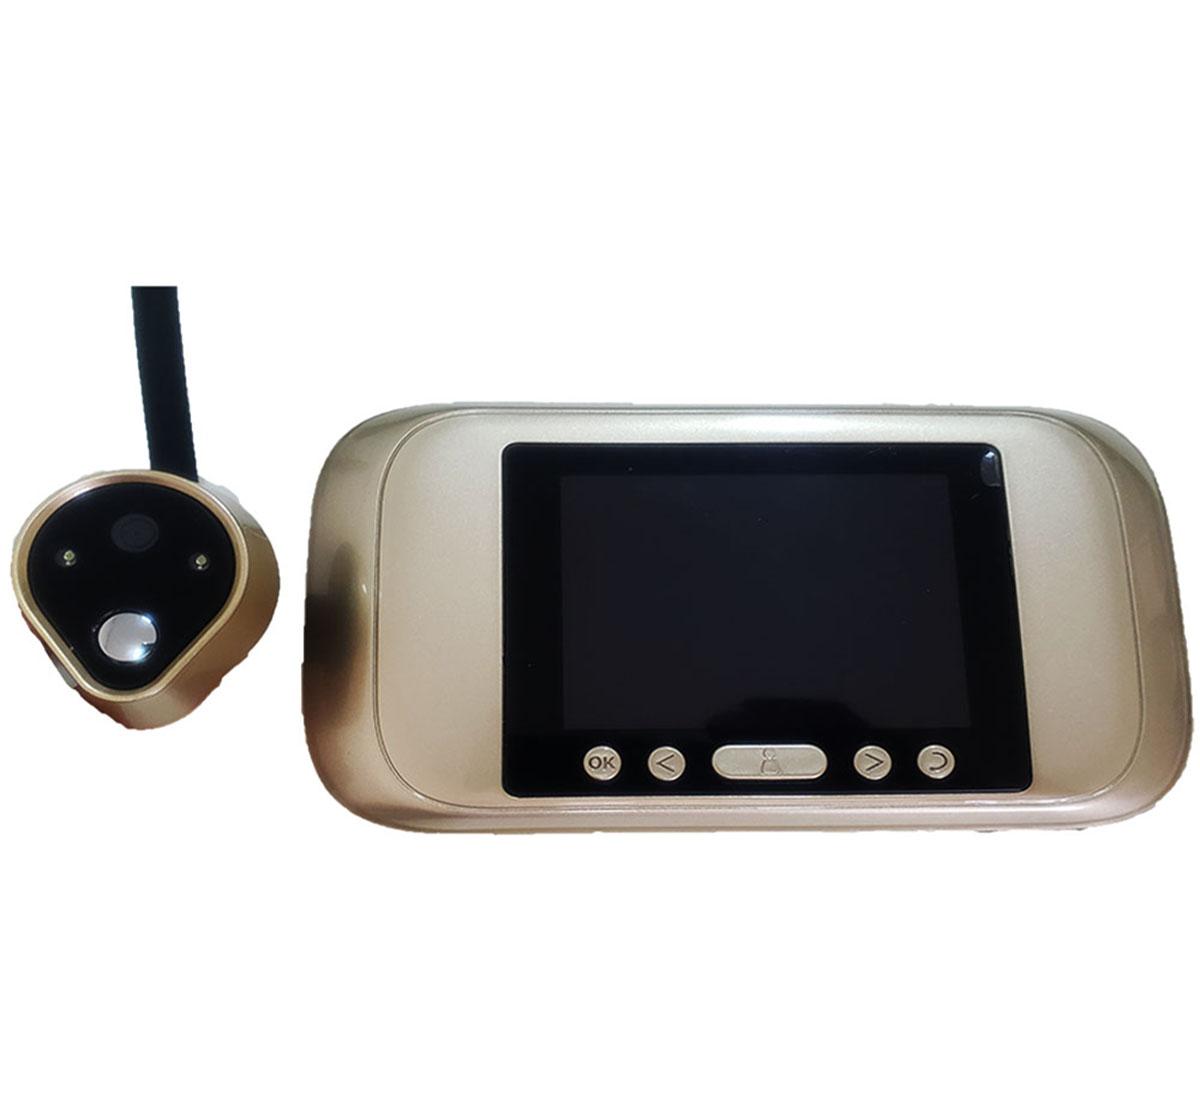 Olho Mágico HD 720p HD Grava foto e vídeo suporta SD até 32GB